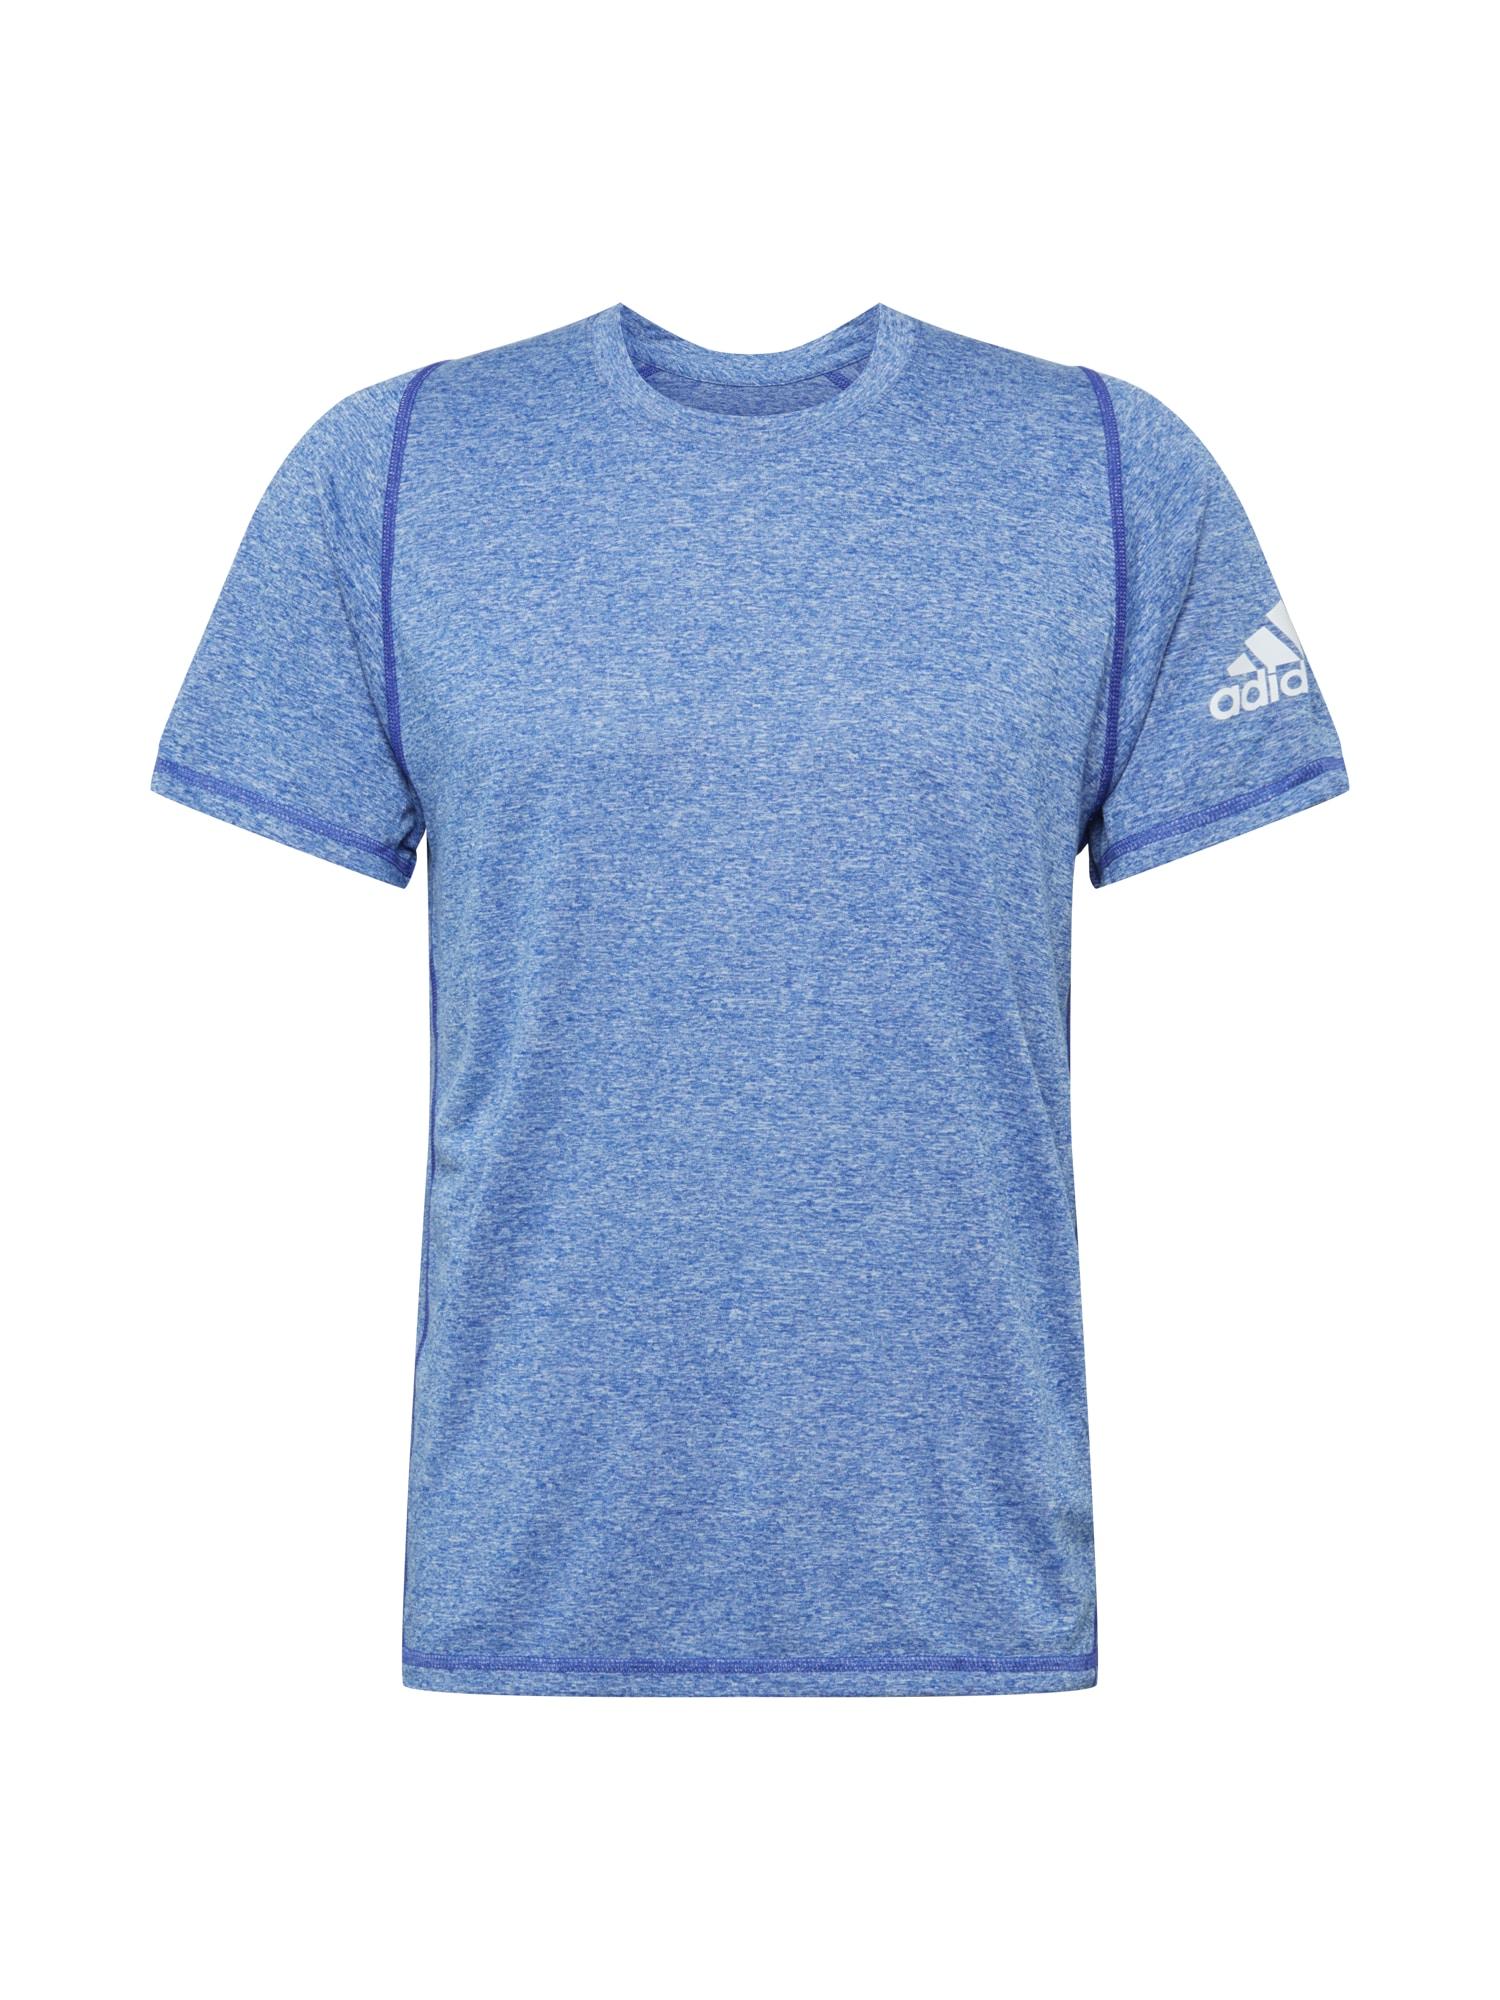 ADIDAS PERFORMANCE Funkční tričko  modrá / bílá